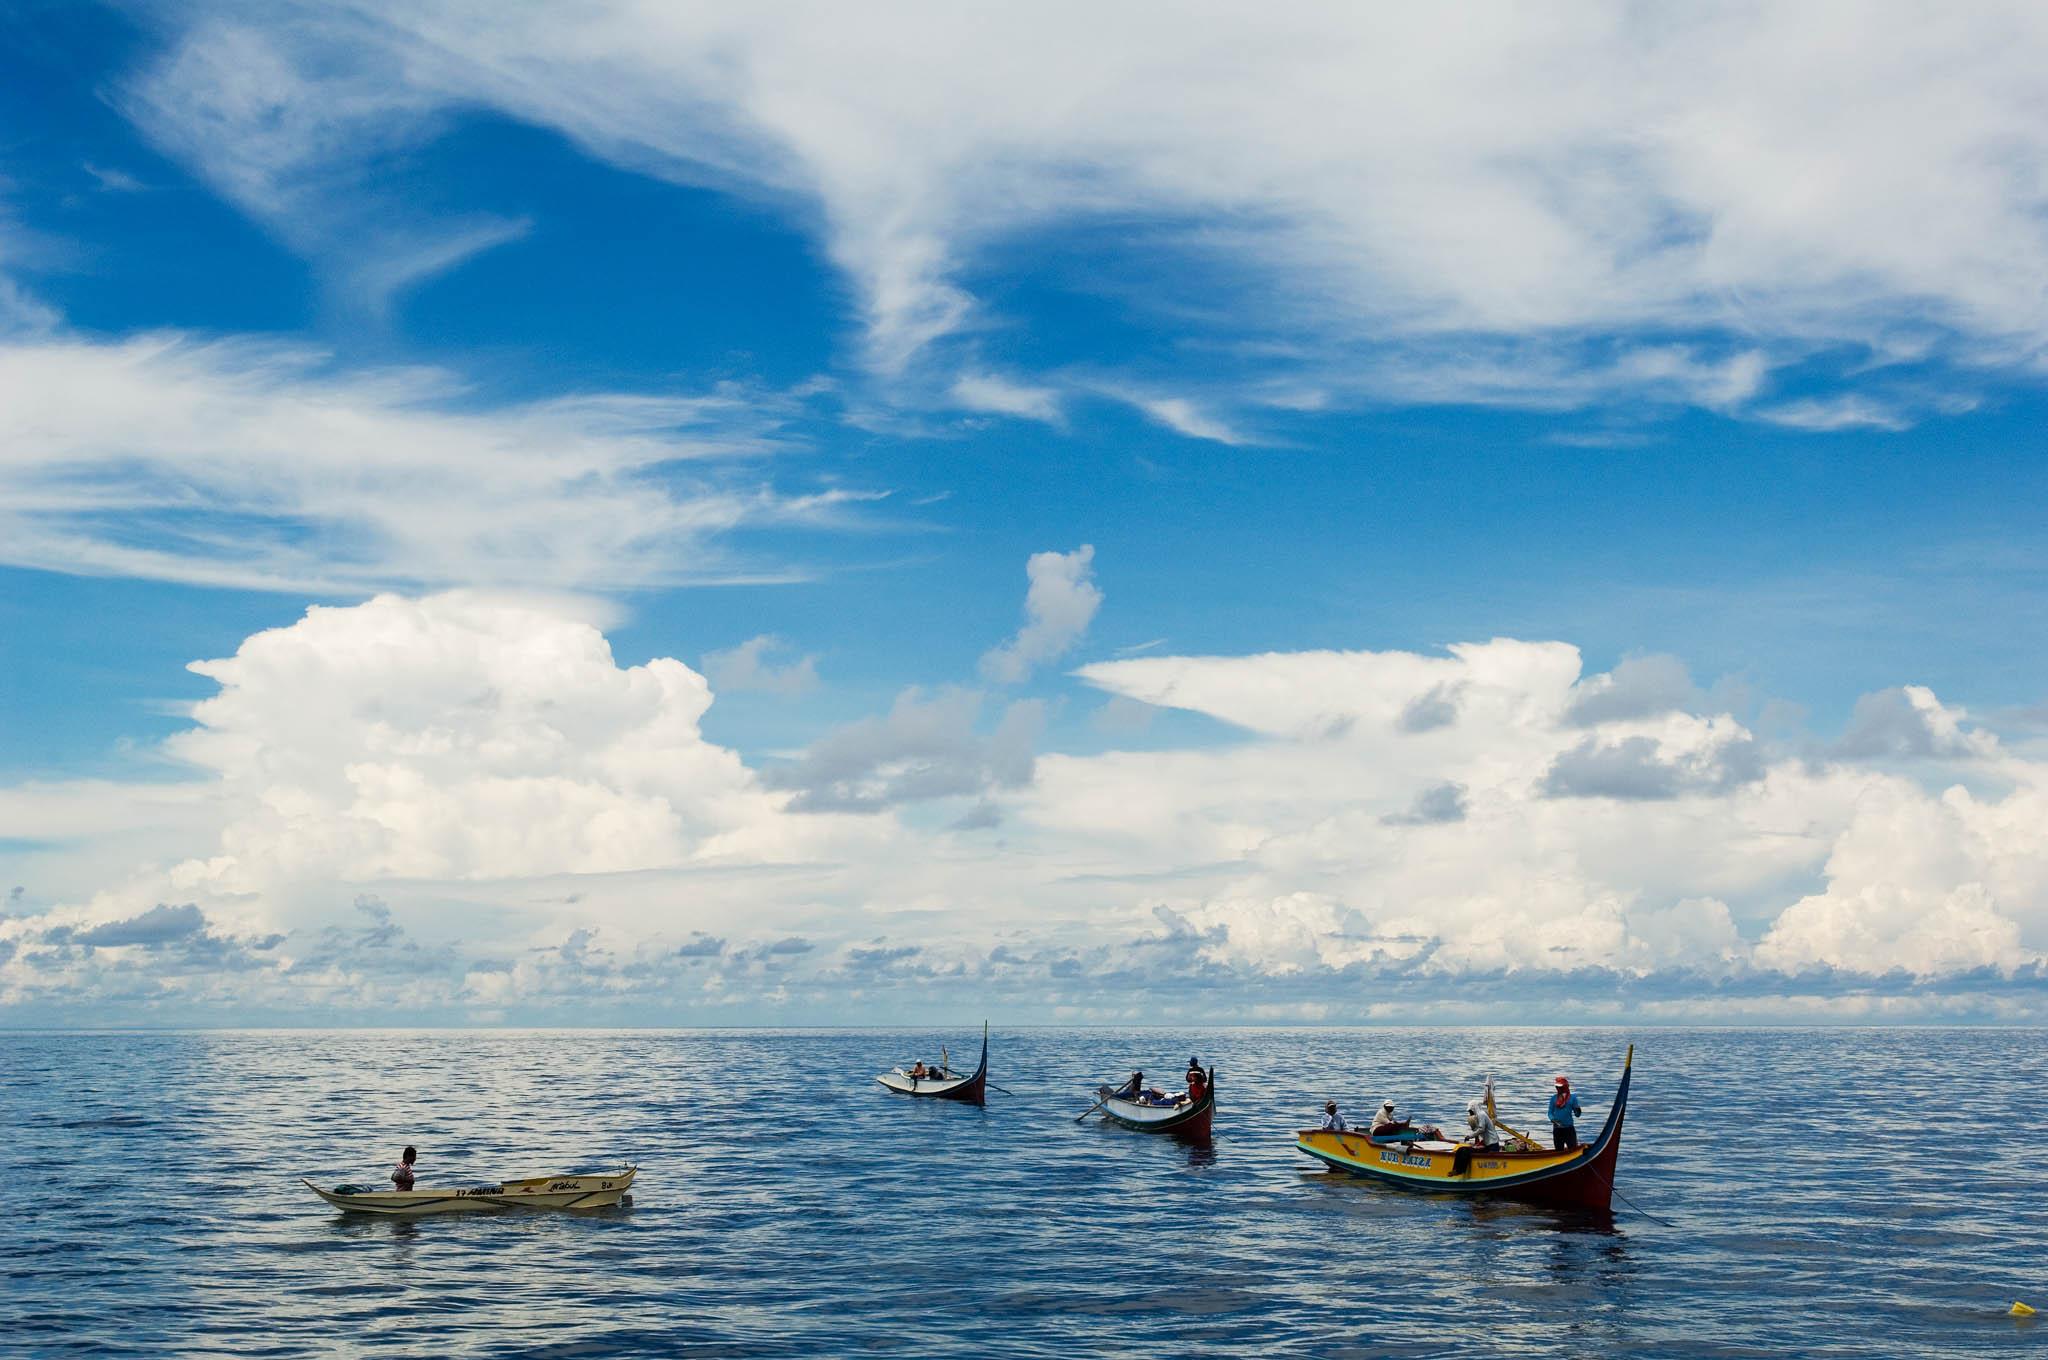 Men riding small boats on sea (© National Geographic Creative/Mauricio Handler)